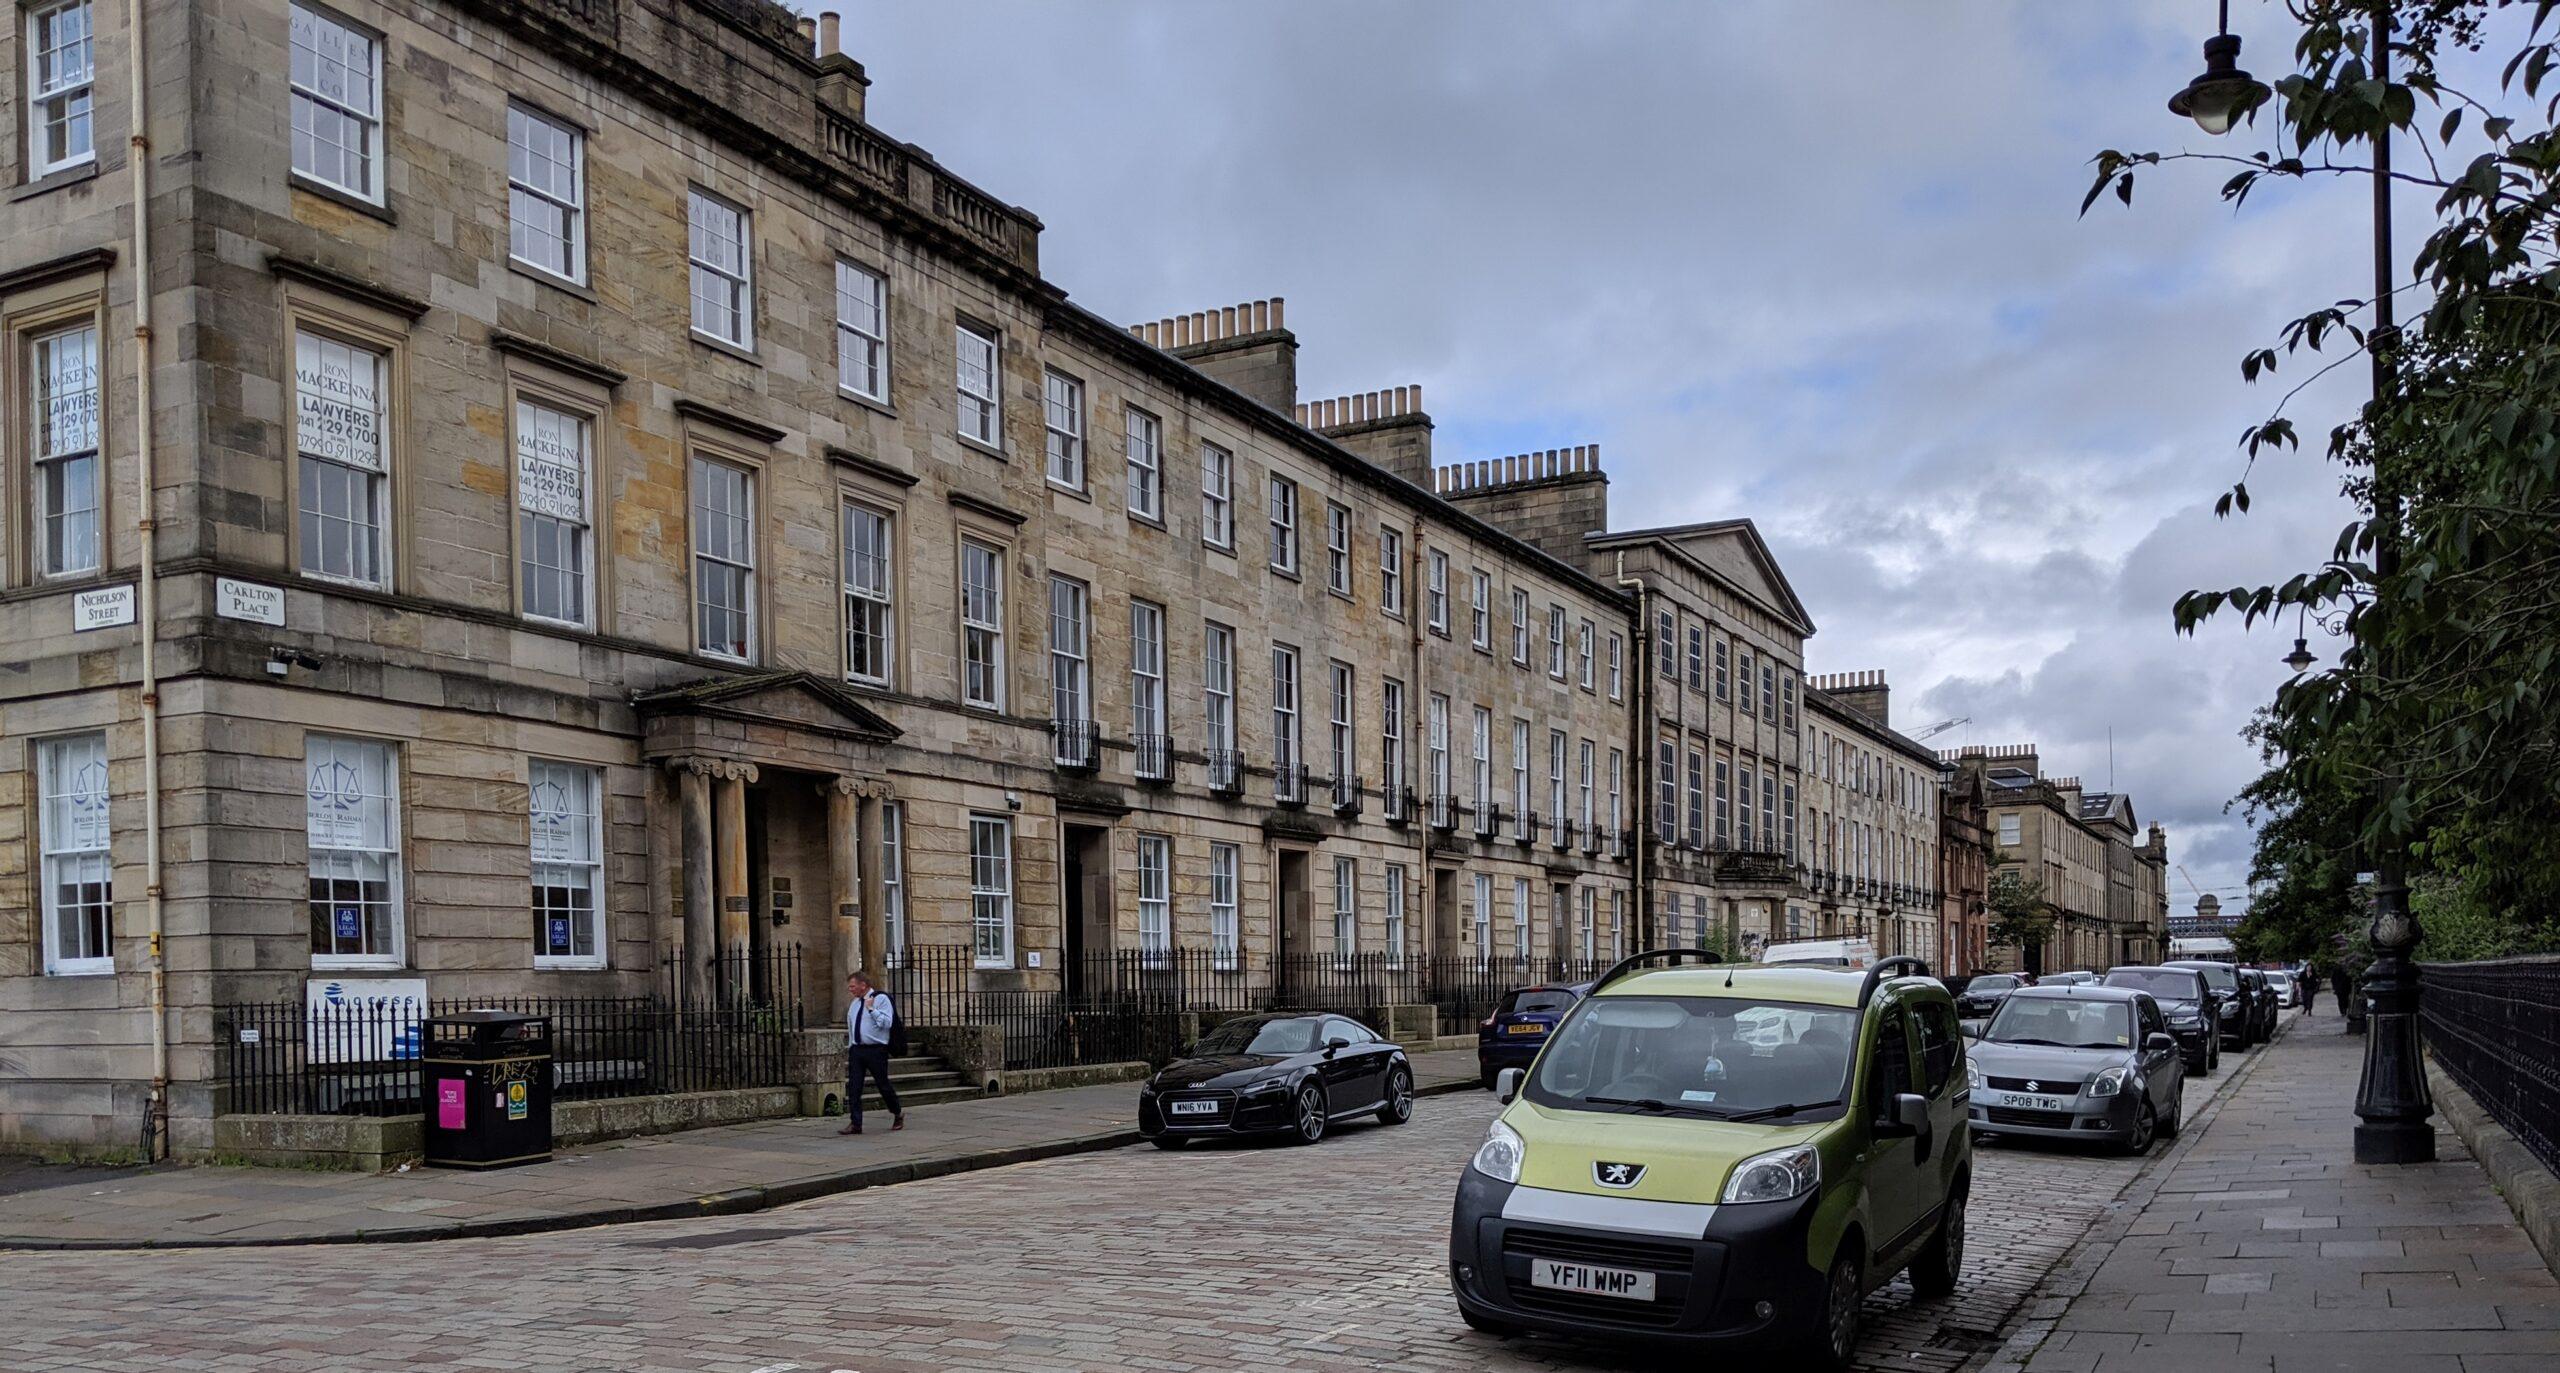 Long row of three-story buildings facing a street